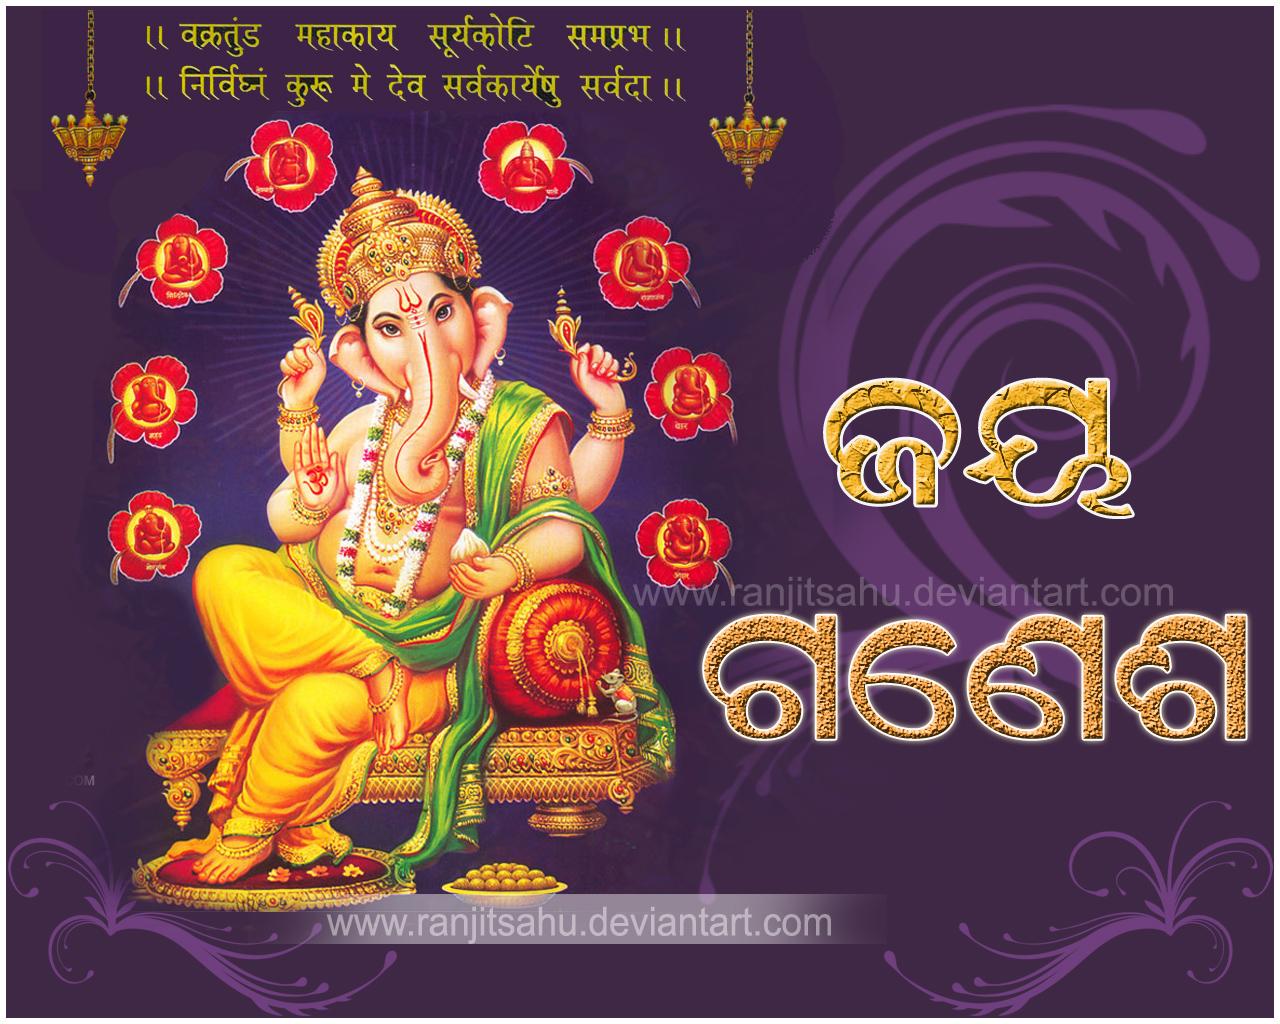 Jai Ganesh Odia Wallpapers By Ranjitsahu On Deviantart